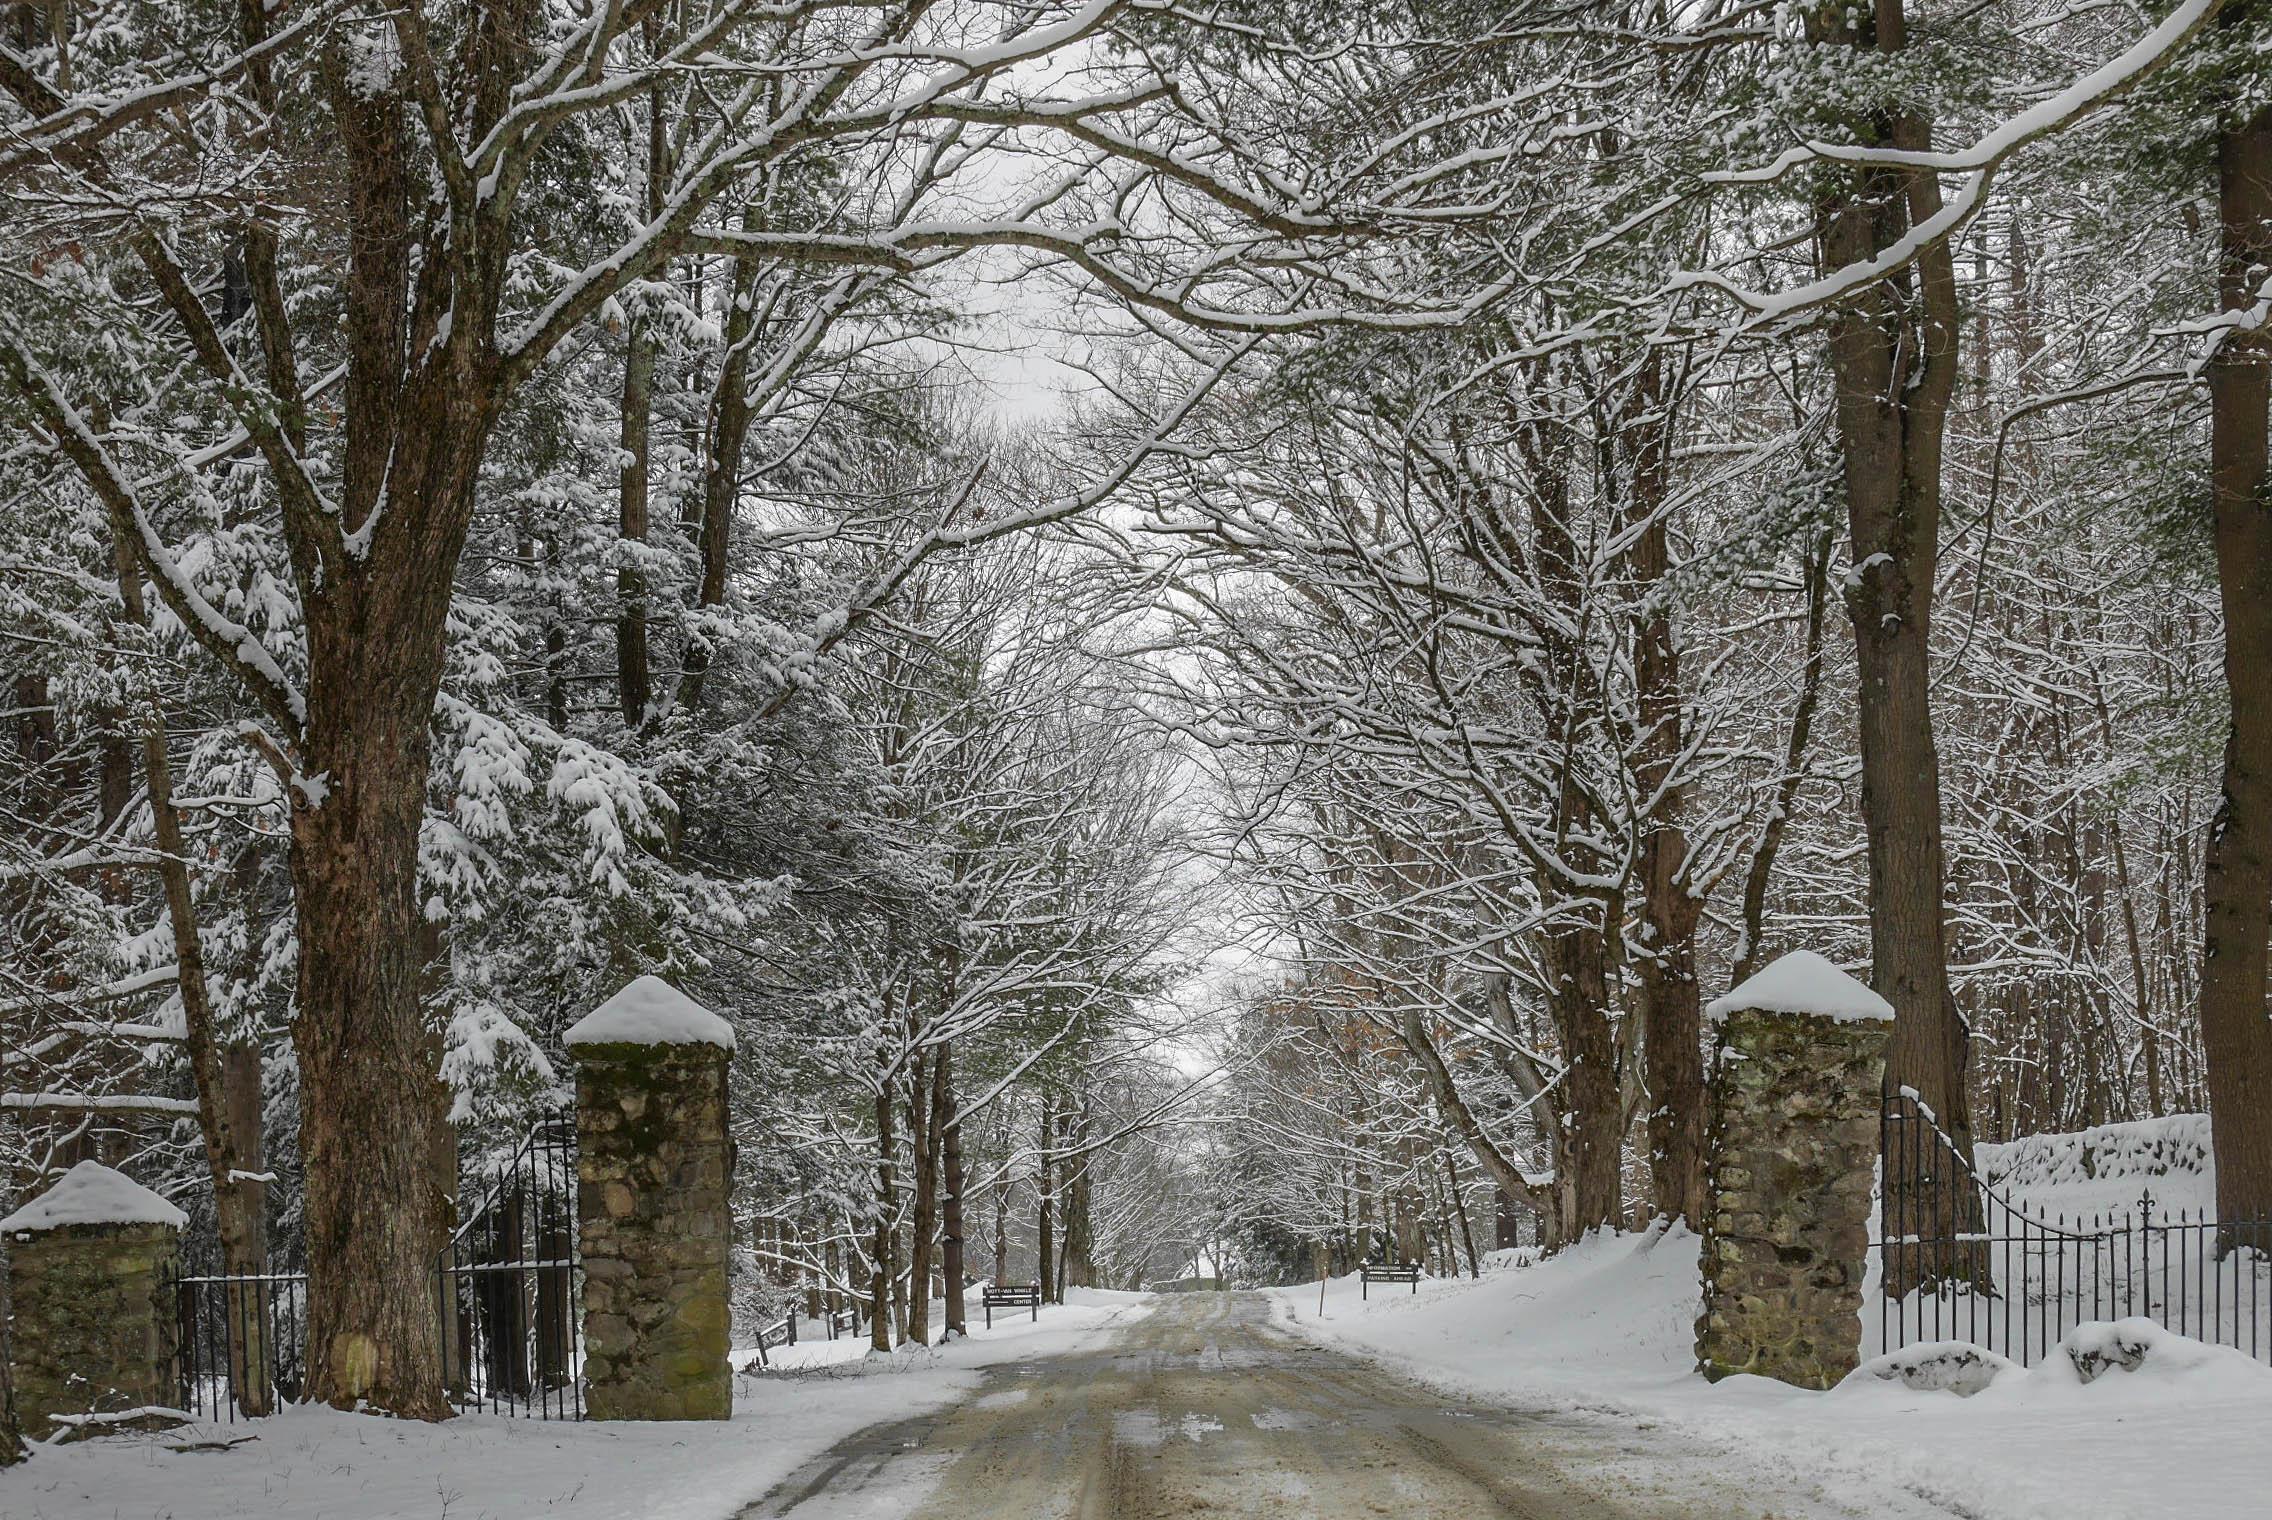 White Memorial - Litchfield, CT